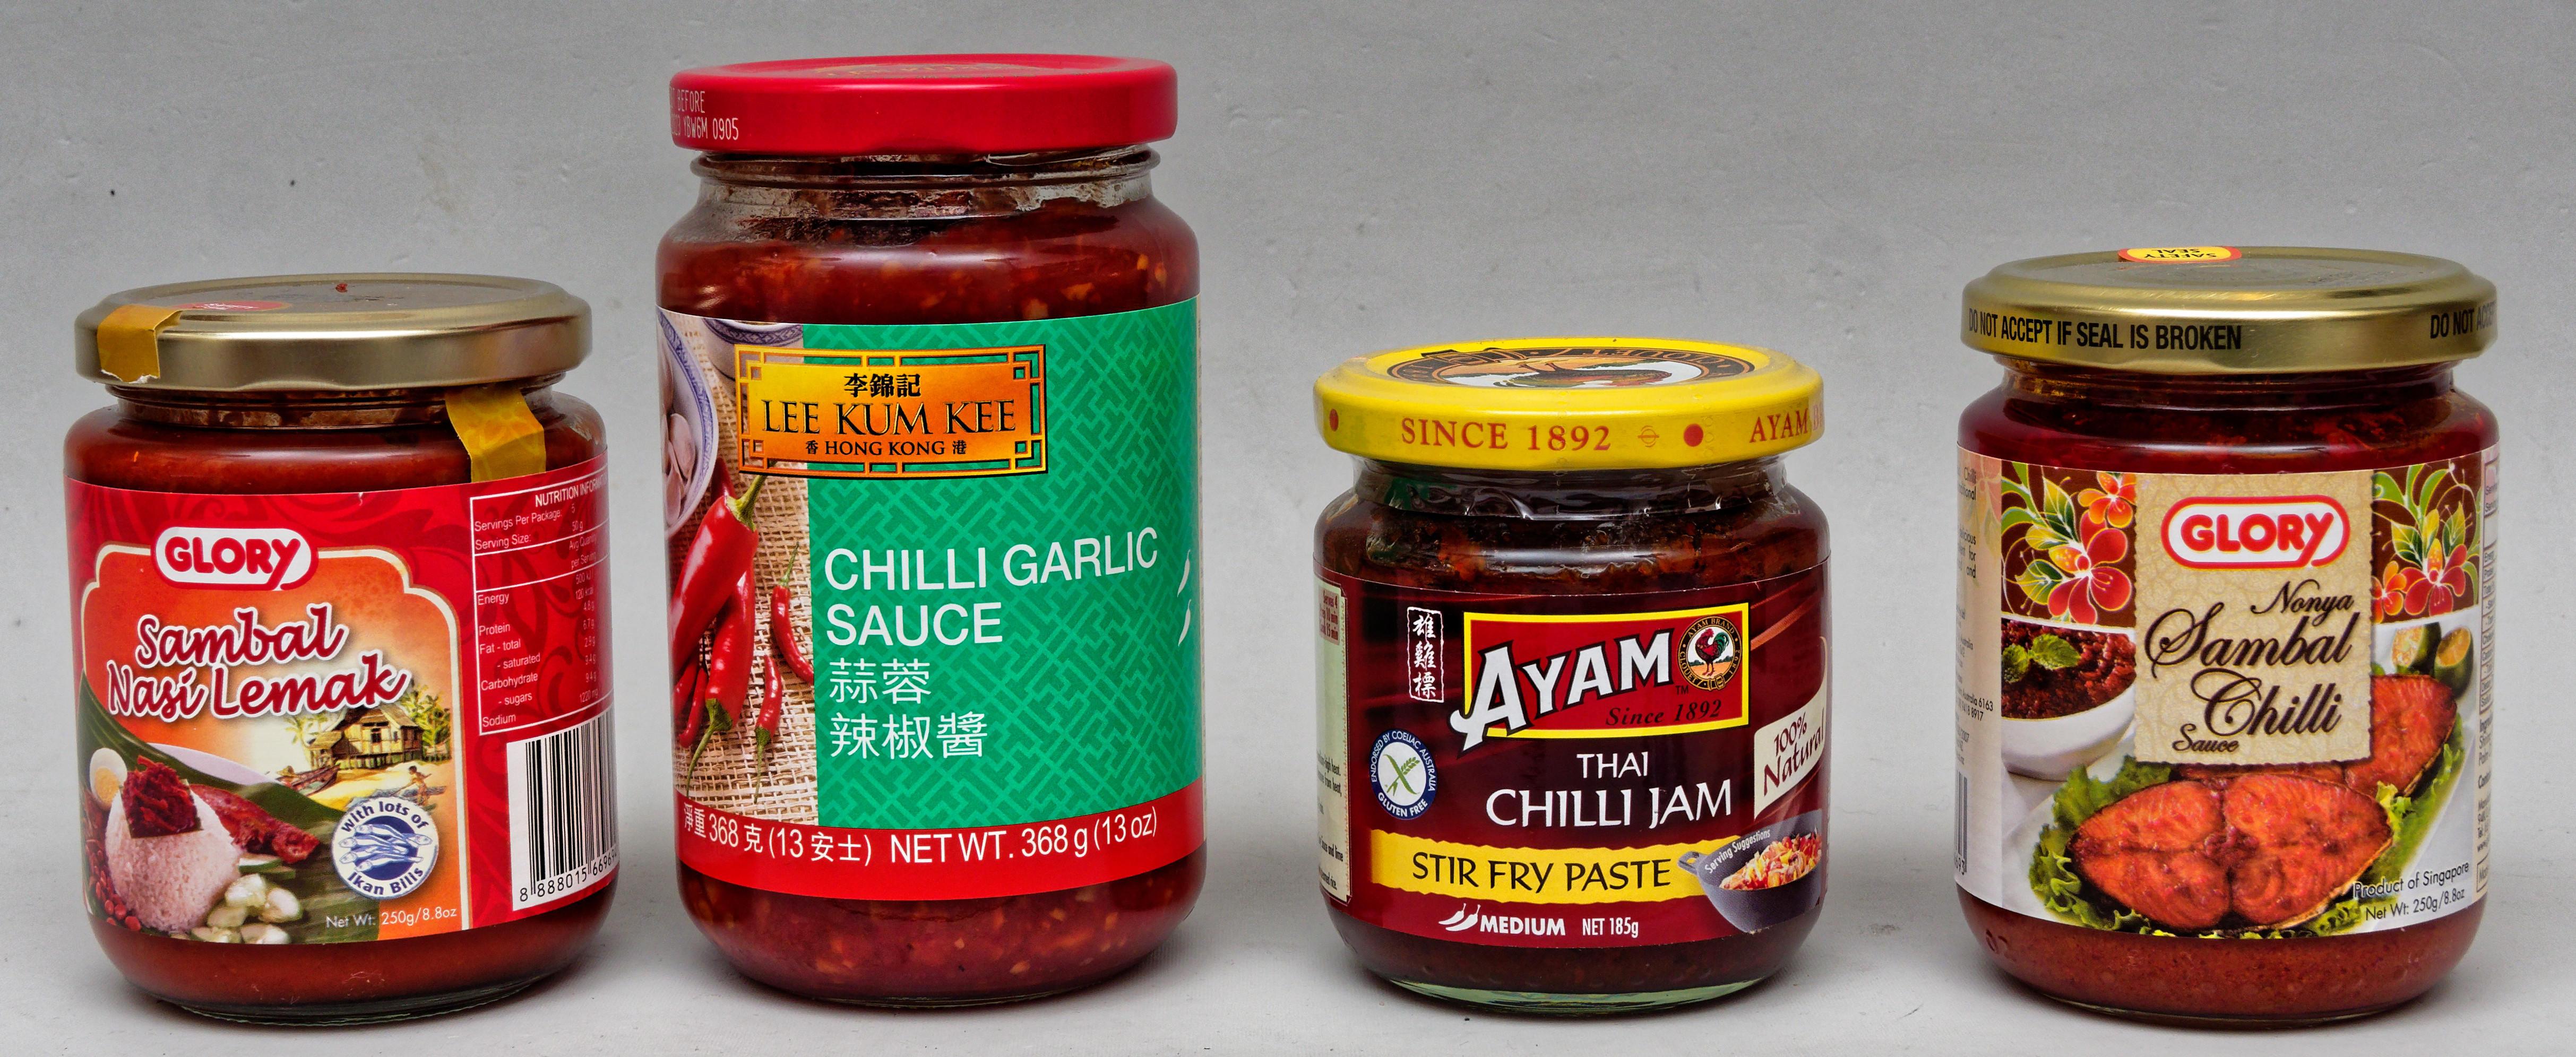 Chili-sauces.jpeg